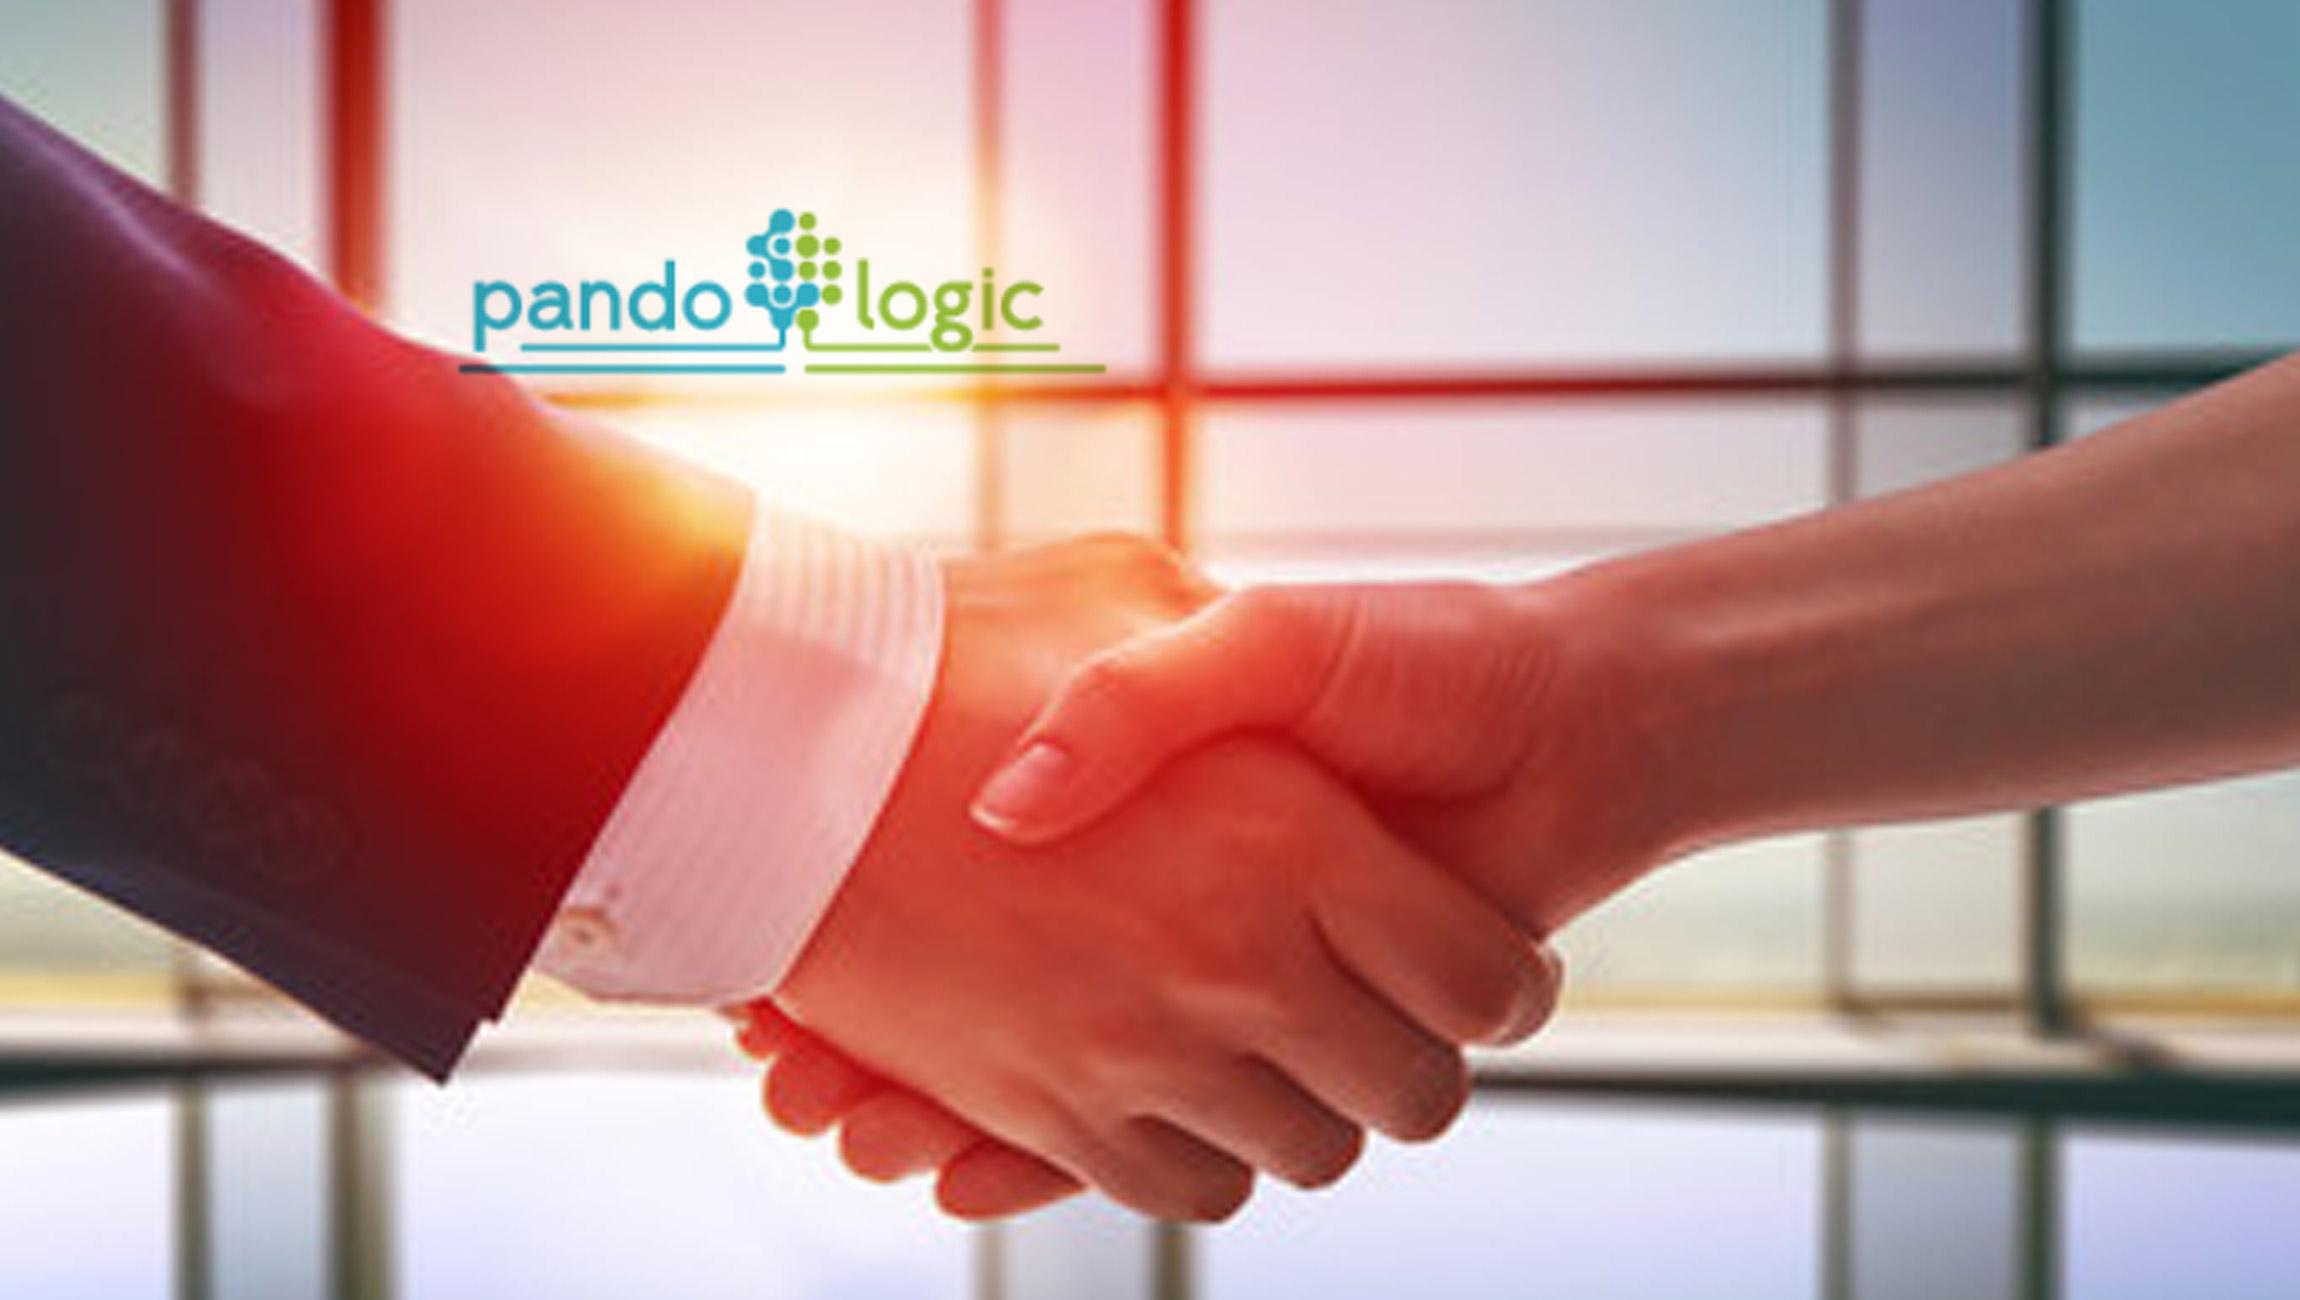 PandoLogic Inc. Acquires Conversational AI Recruiting Provider Wade & Wendy 1